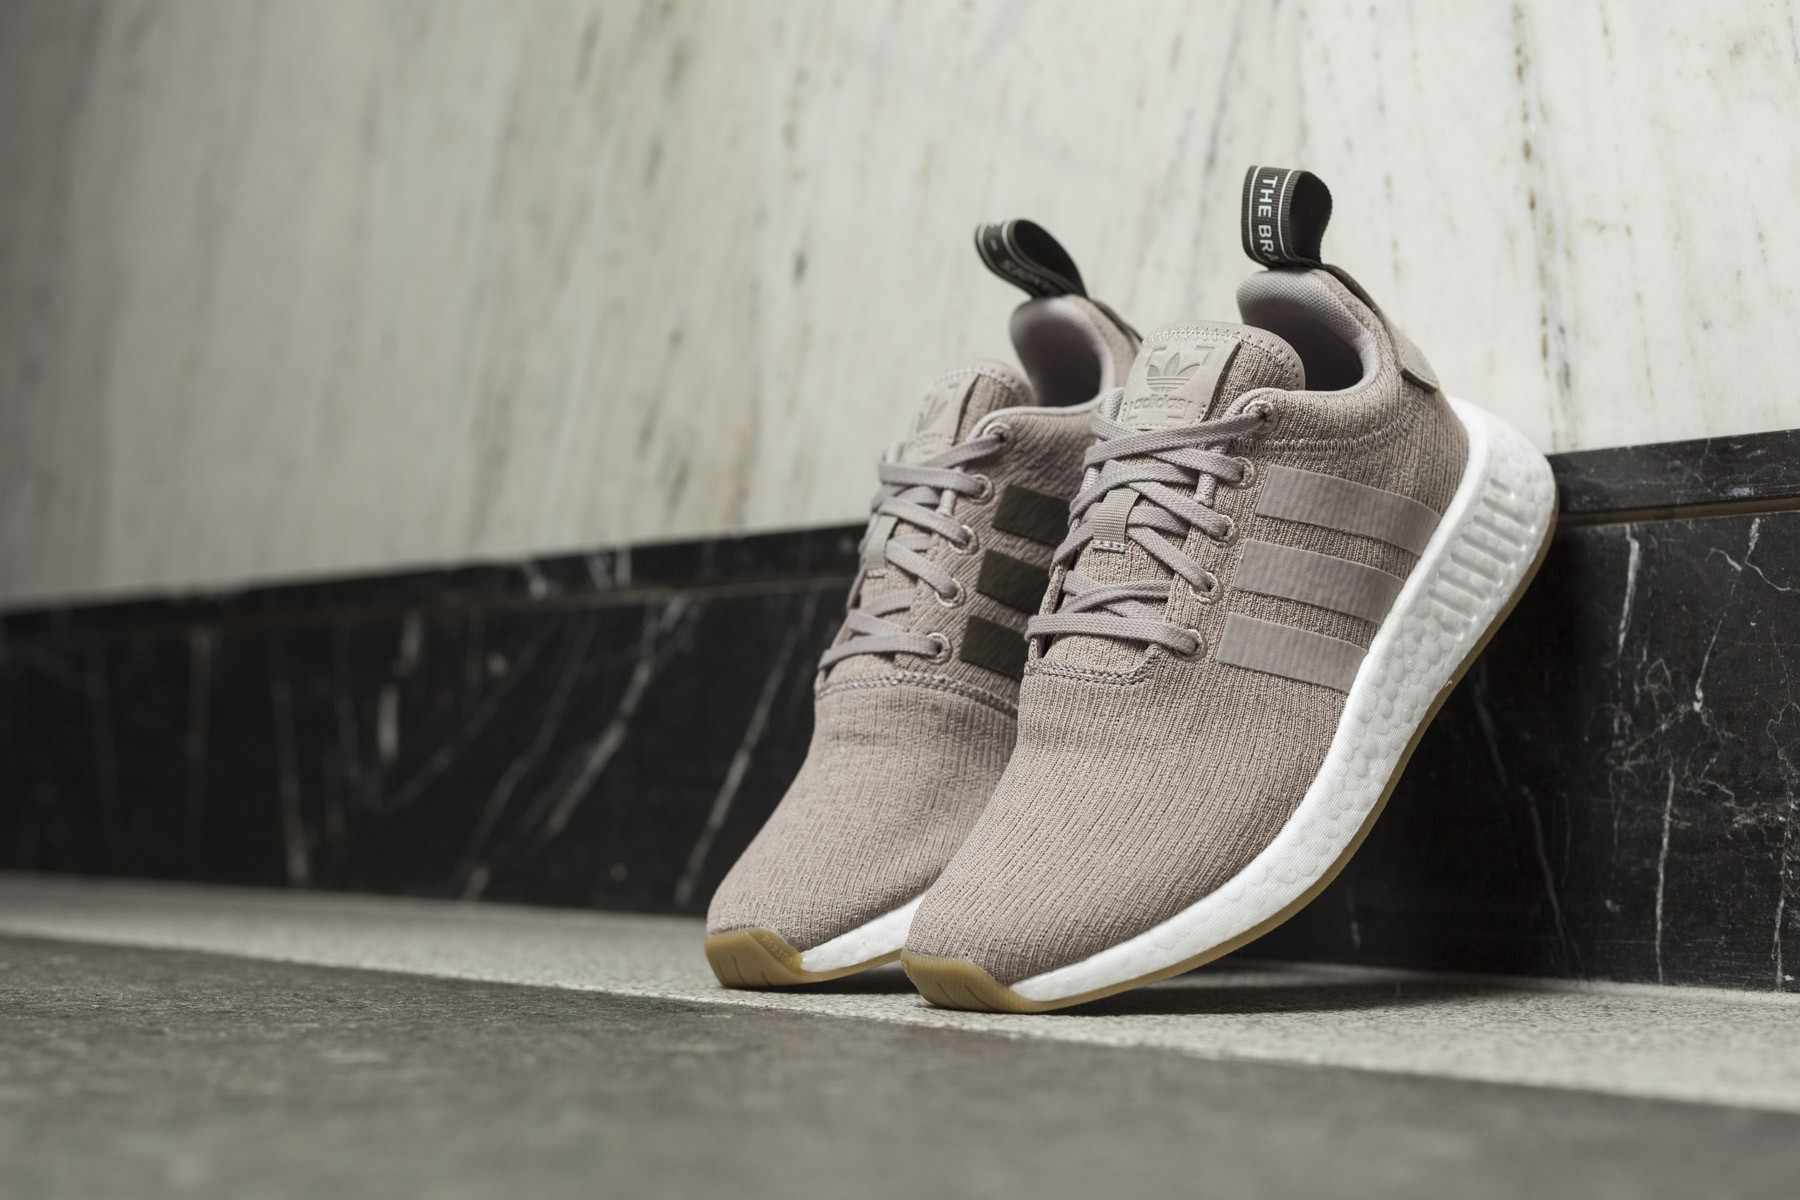 a3e0b2a40 Adidas NMD R2 - Sneaker.no